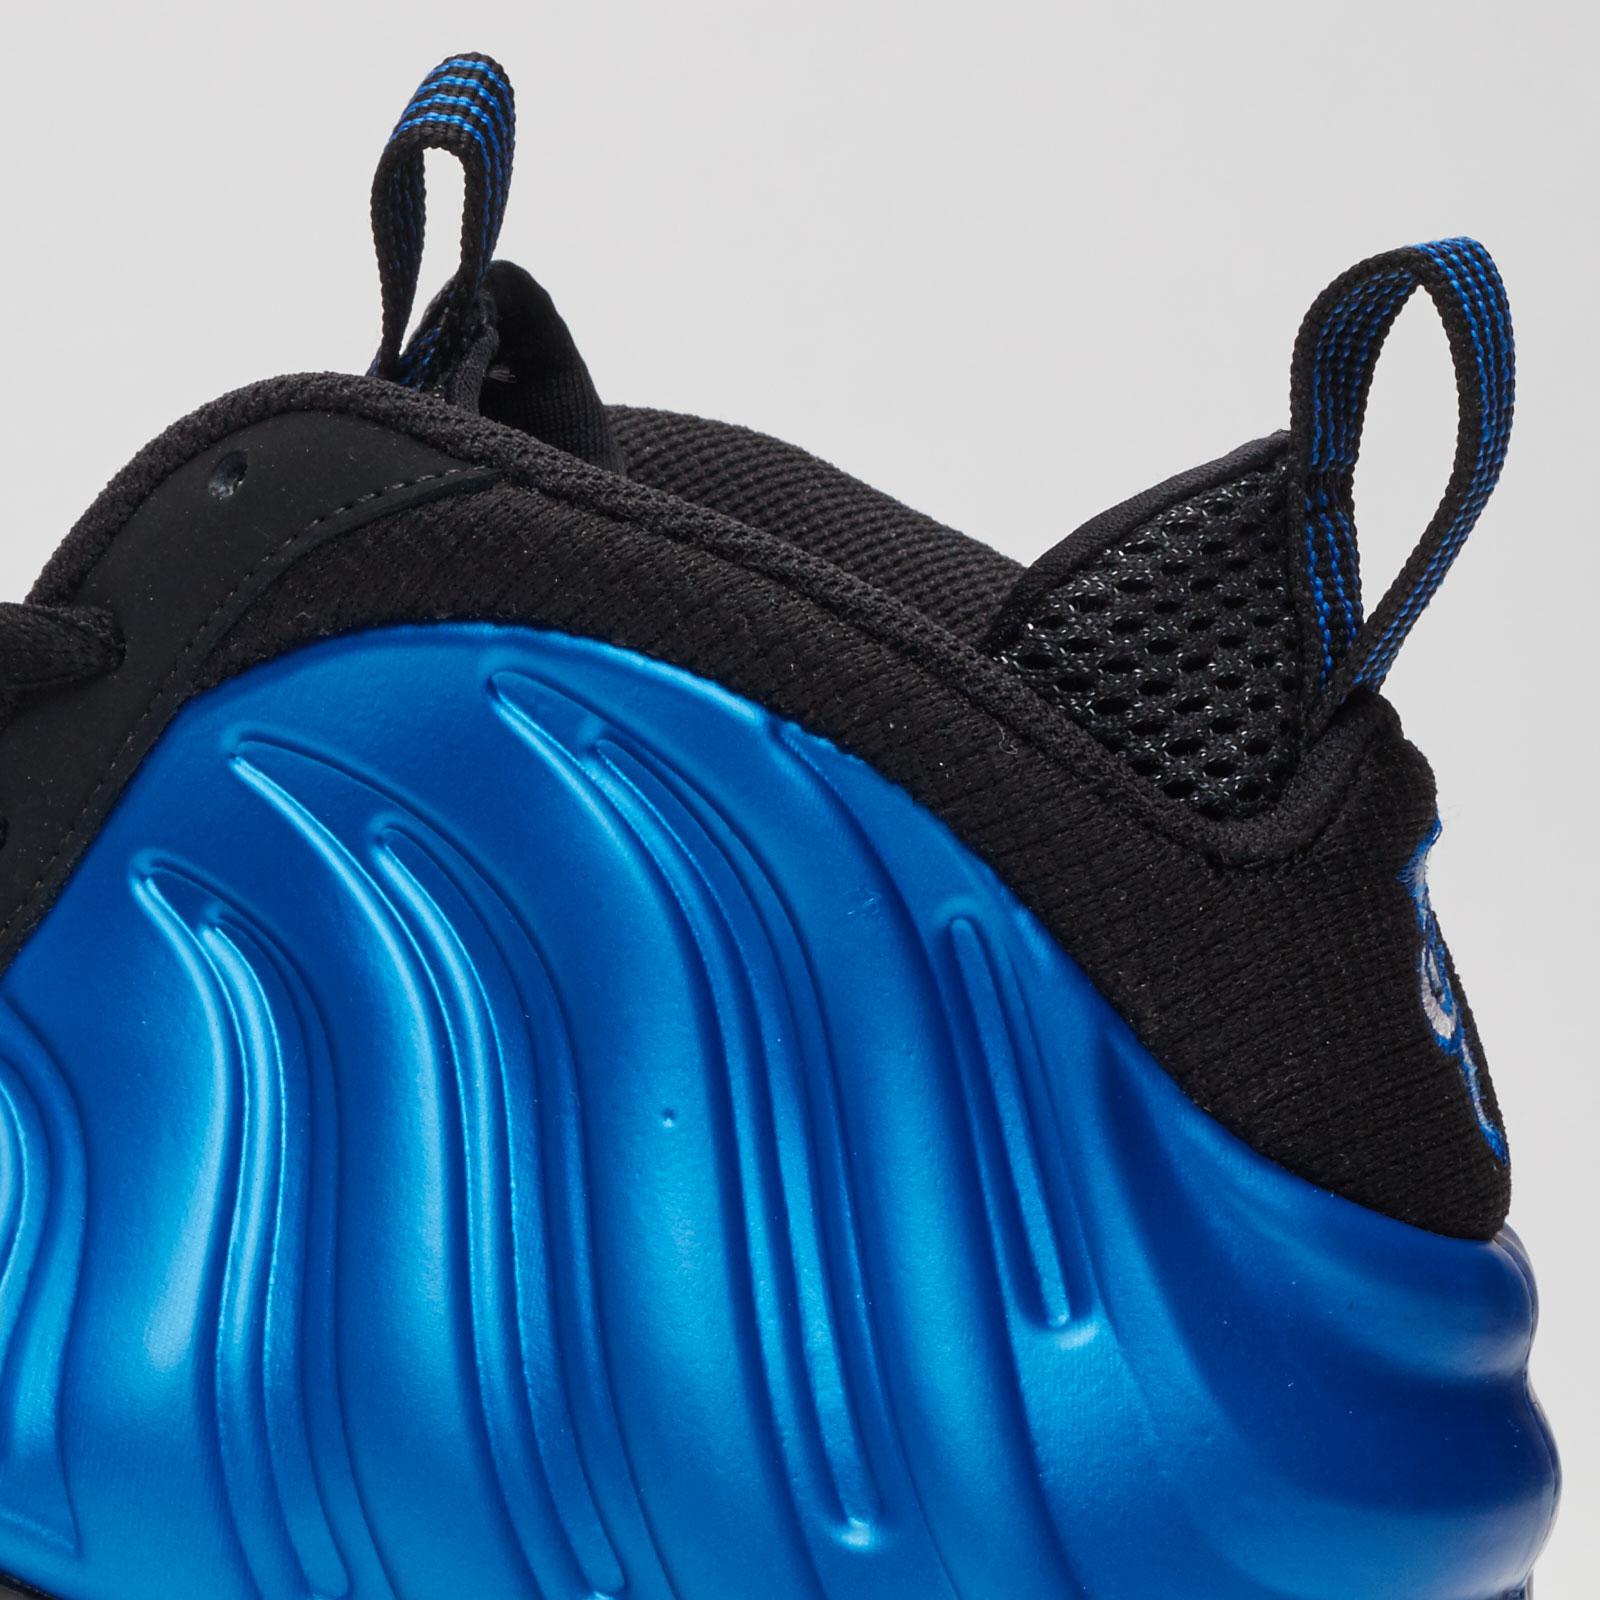 quality design 6788b 45611 Nike Air Foamposite One Xx - 895320-500 - Sneakersnstuff ...